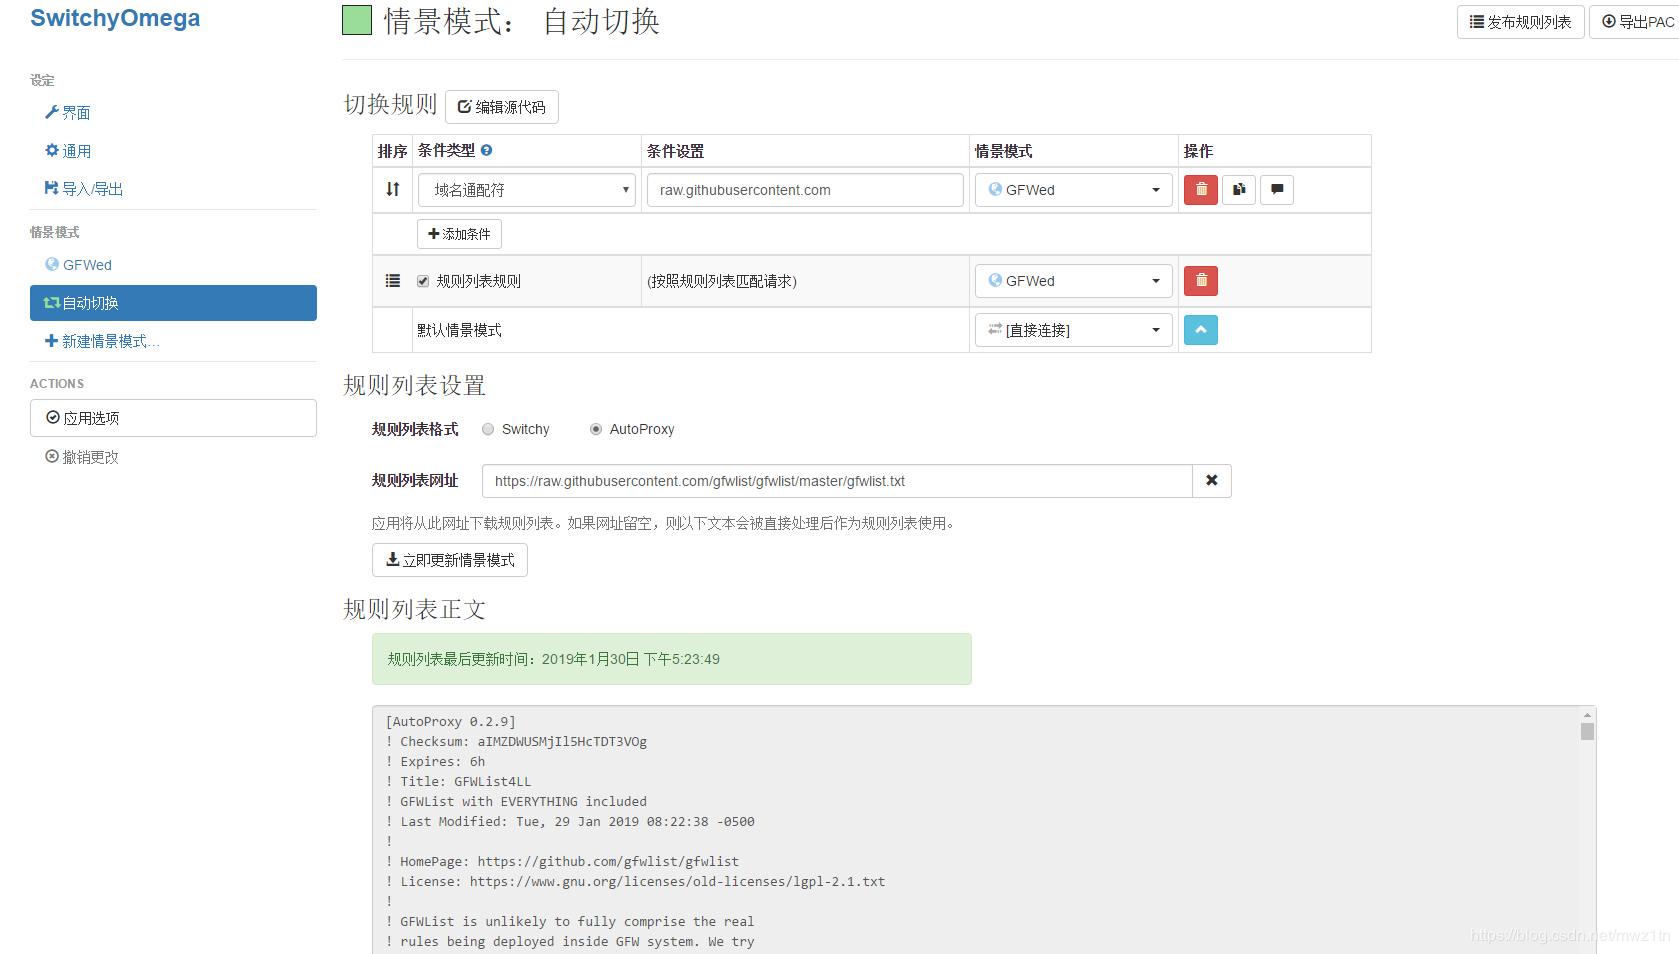 SwitchyOmega配置- 豌豆ip代理